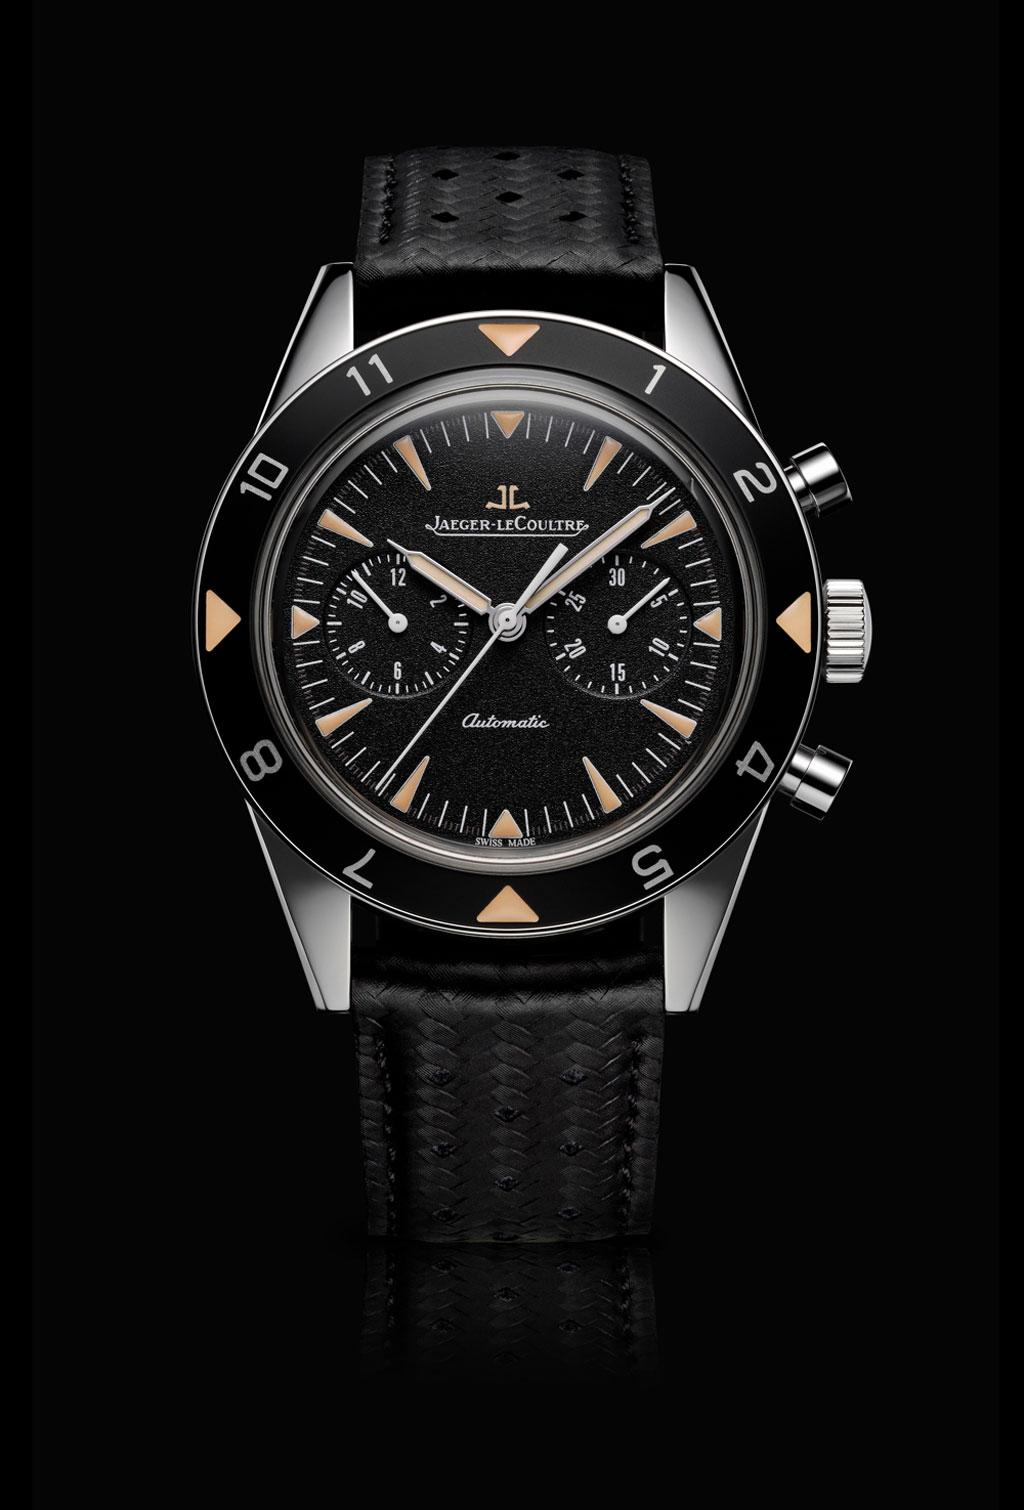 Jaeger Lecoultre Deep Sea Vintage Chronograph Extravaganzi